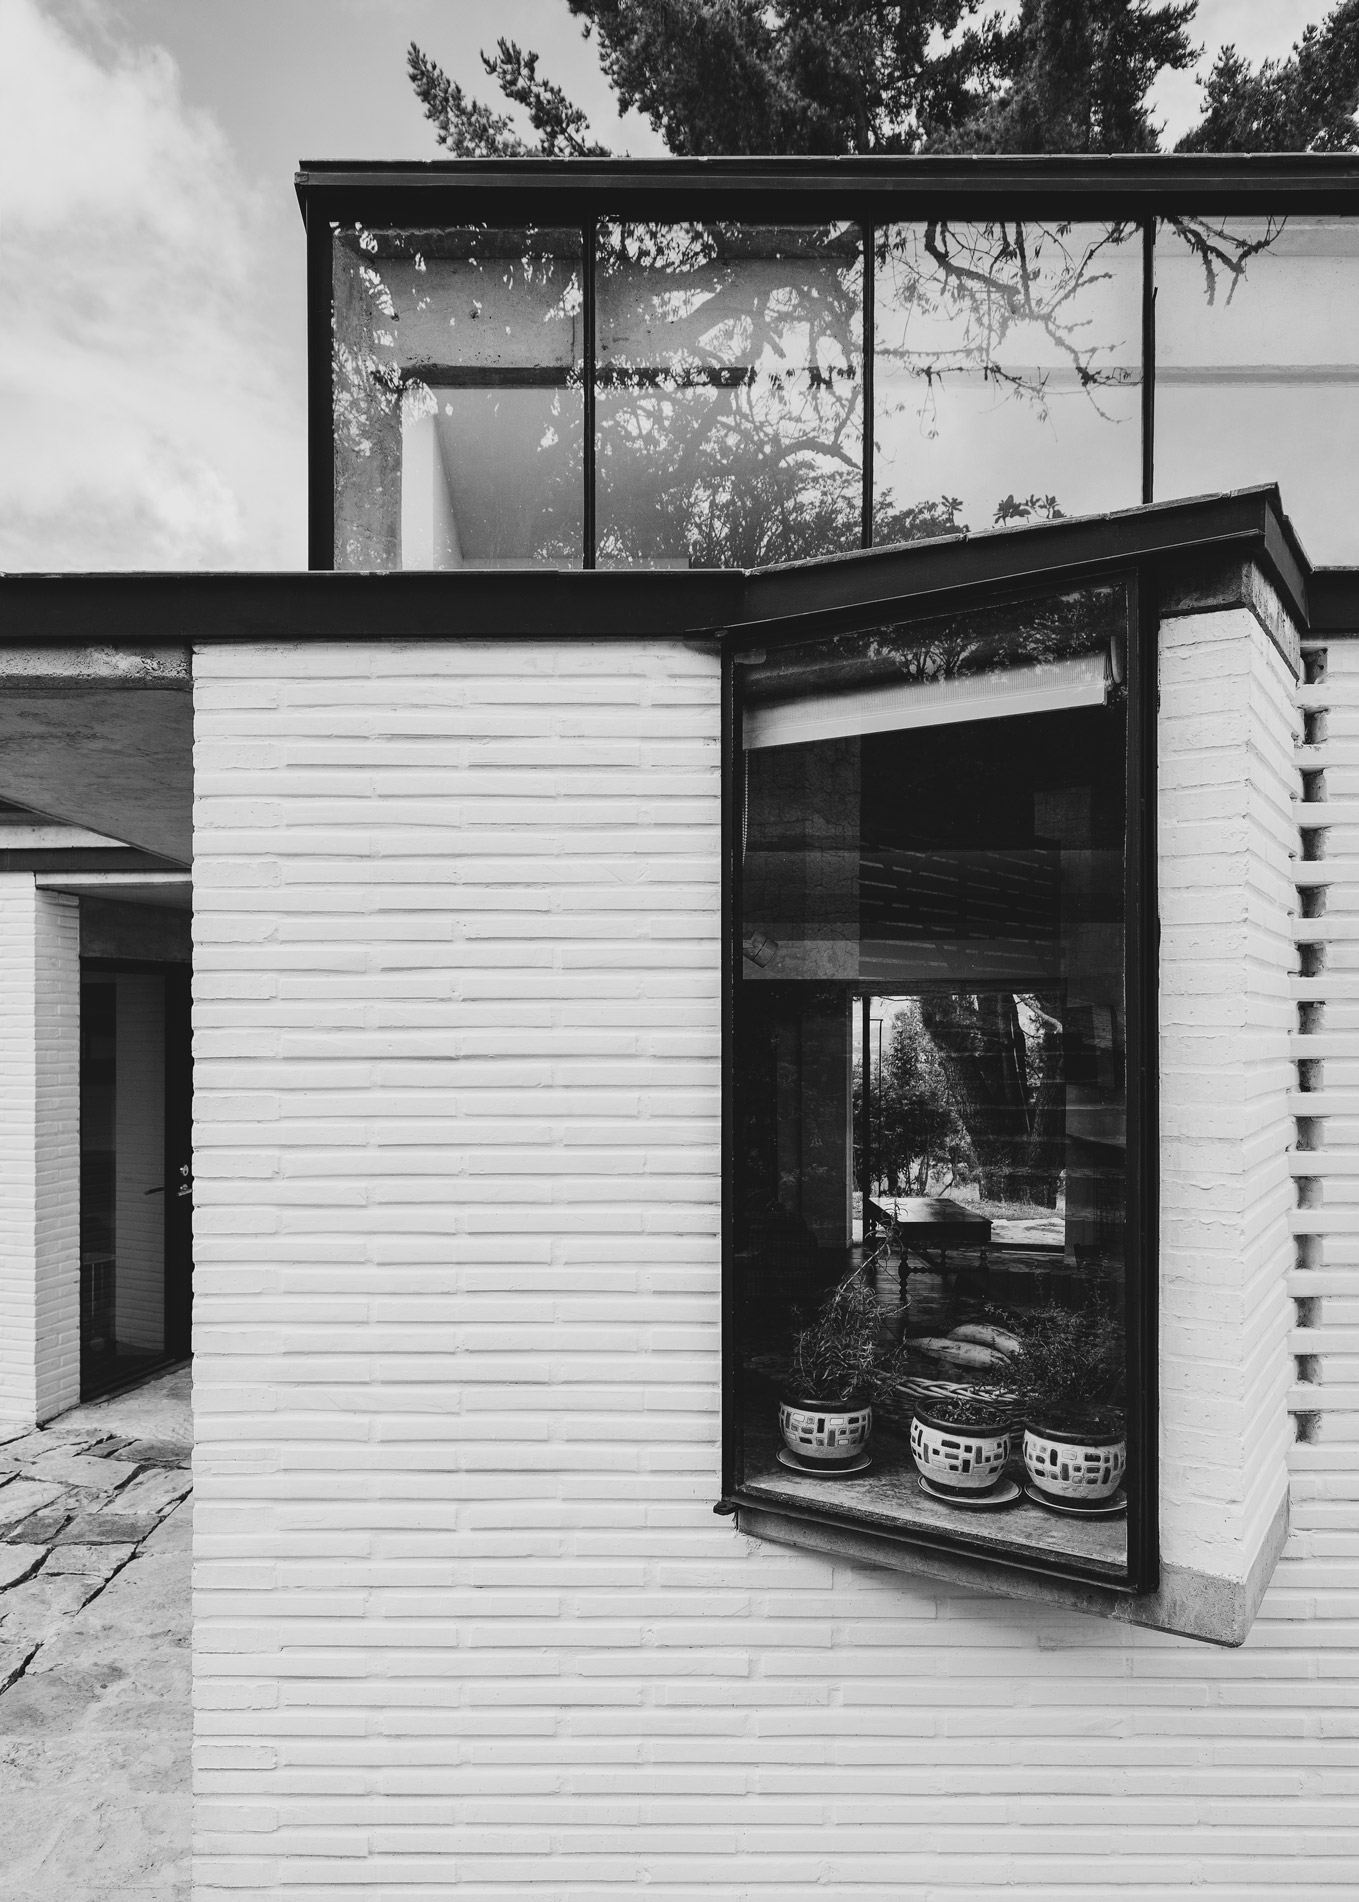 06-oberleander.lucas.simon.bosch.photography.colombia.bogota.arquitectura.diseño.fotografia